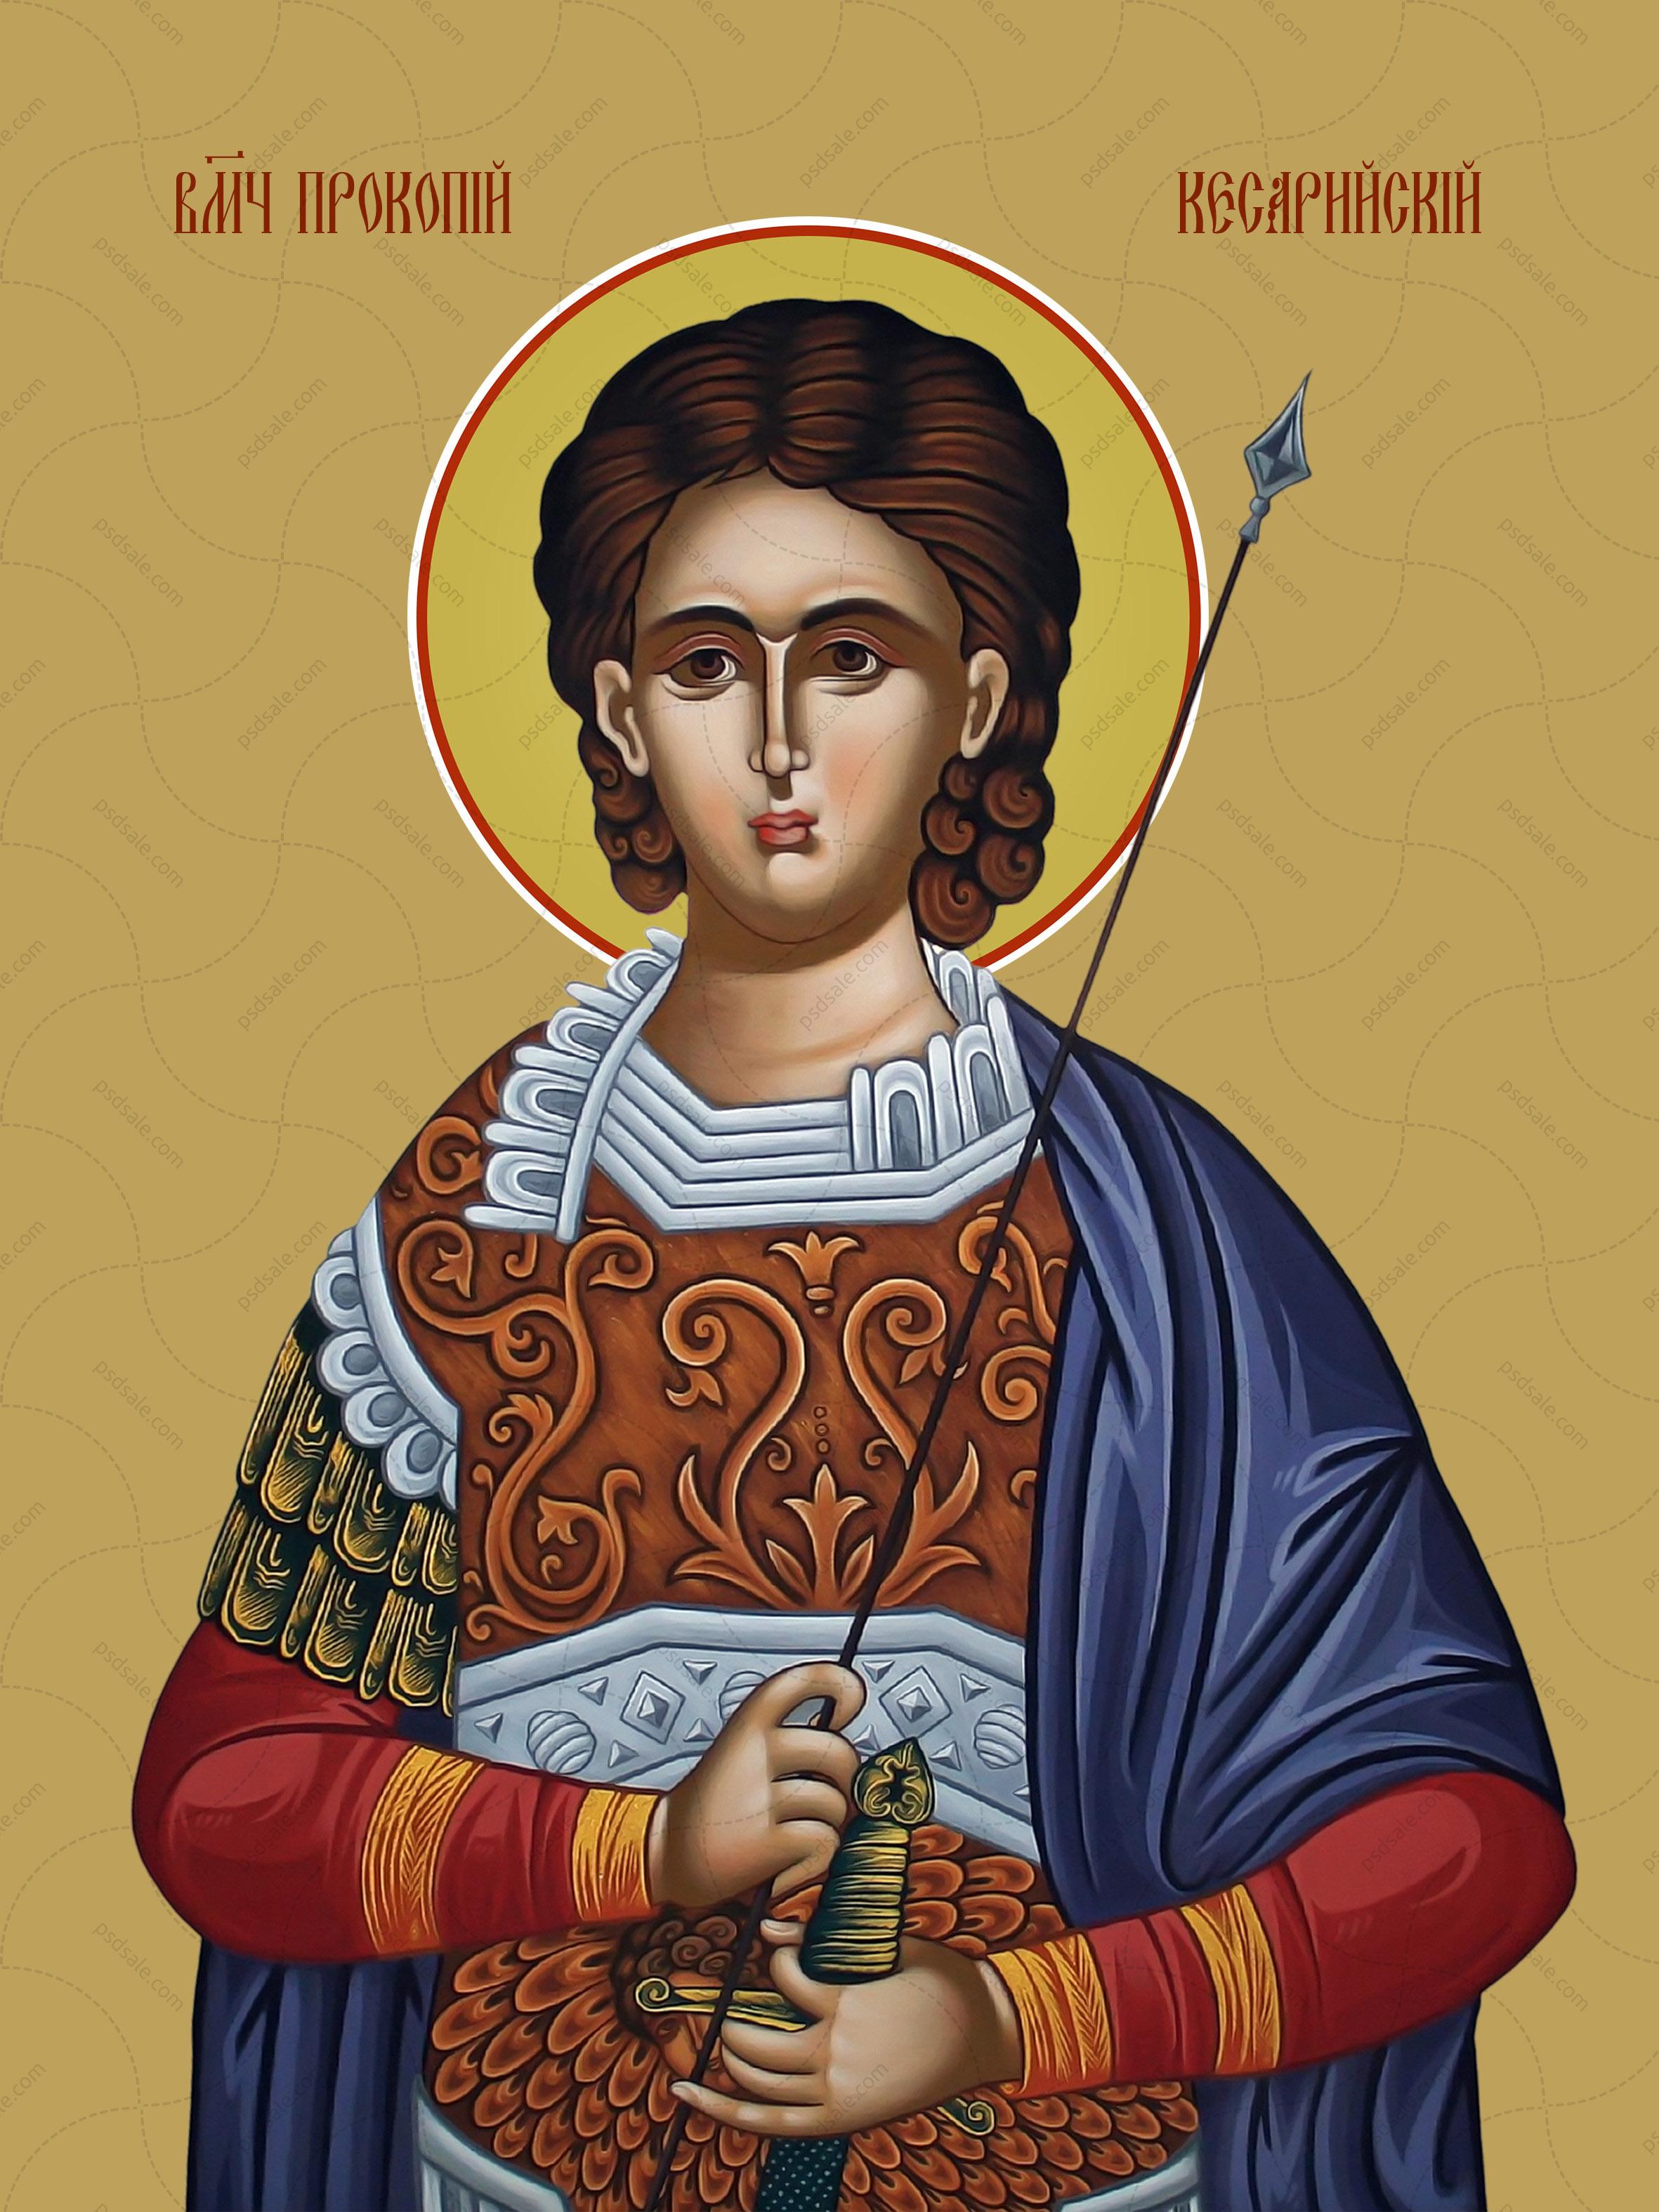 Прокопий Кесарийский, мученик